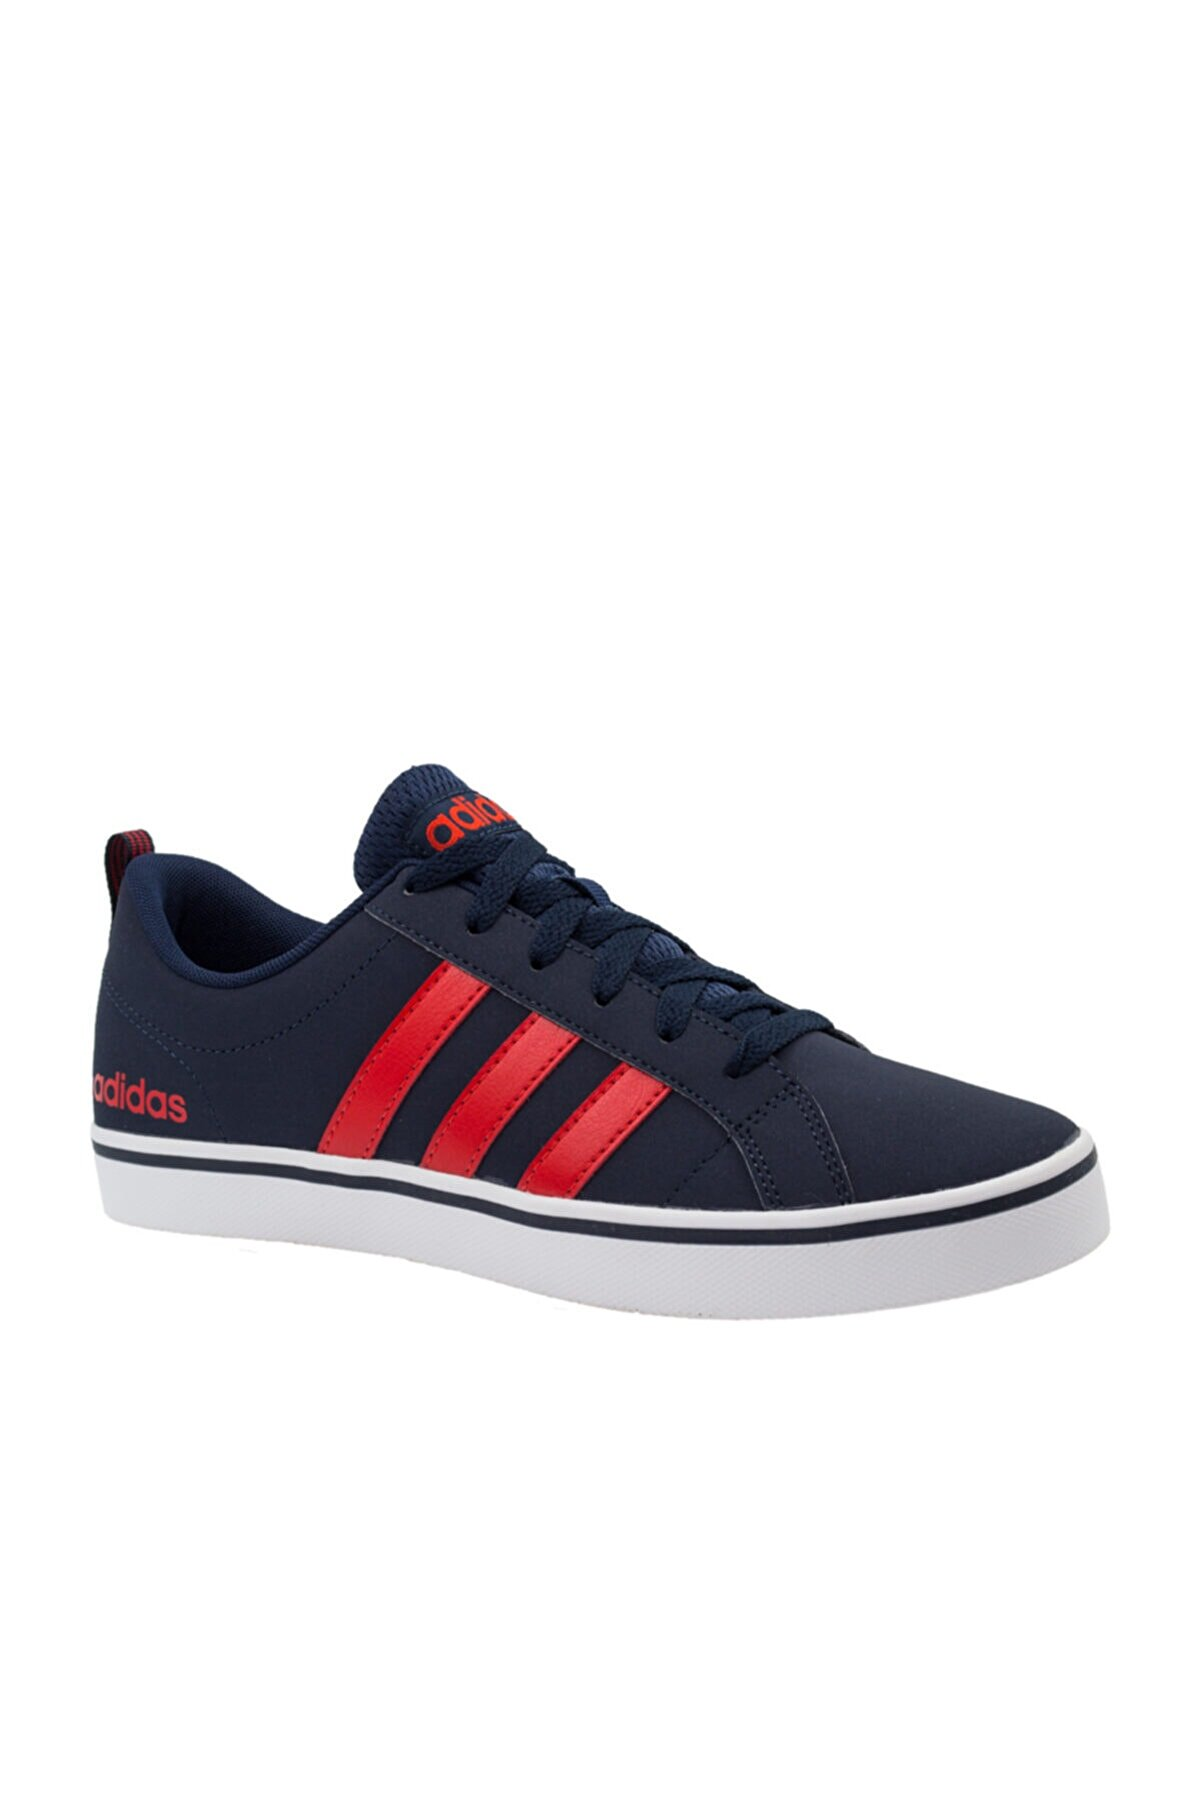 adidas VS PACE Lacivert KIRMIZI Erkek Sneaker 100292487